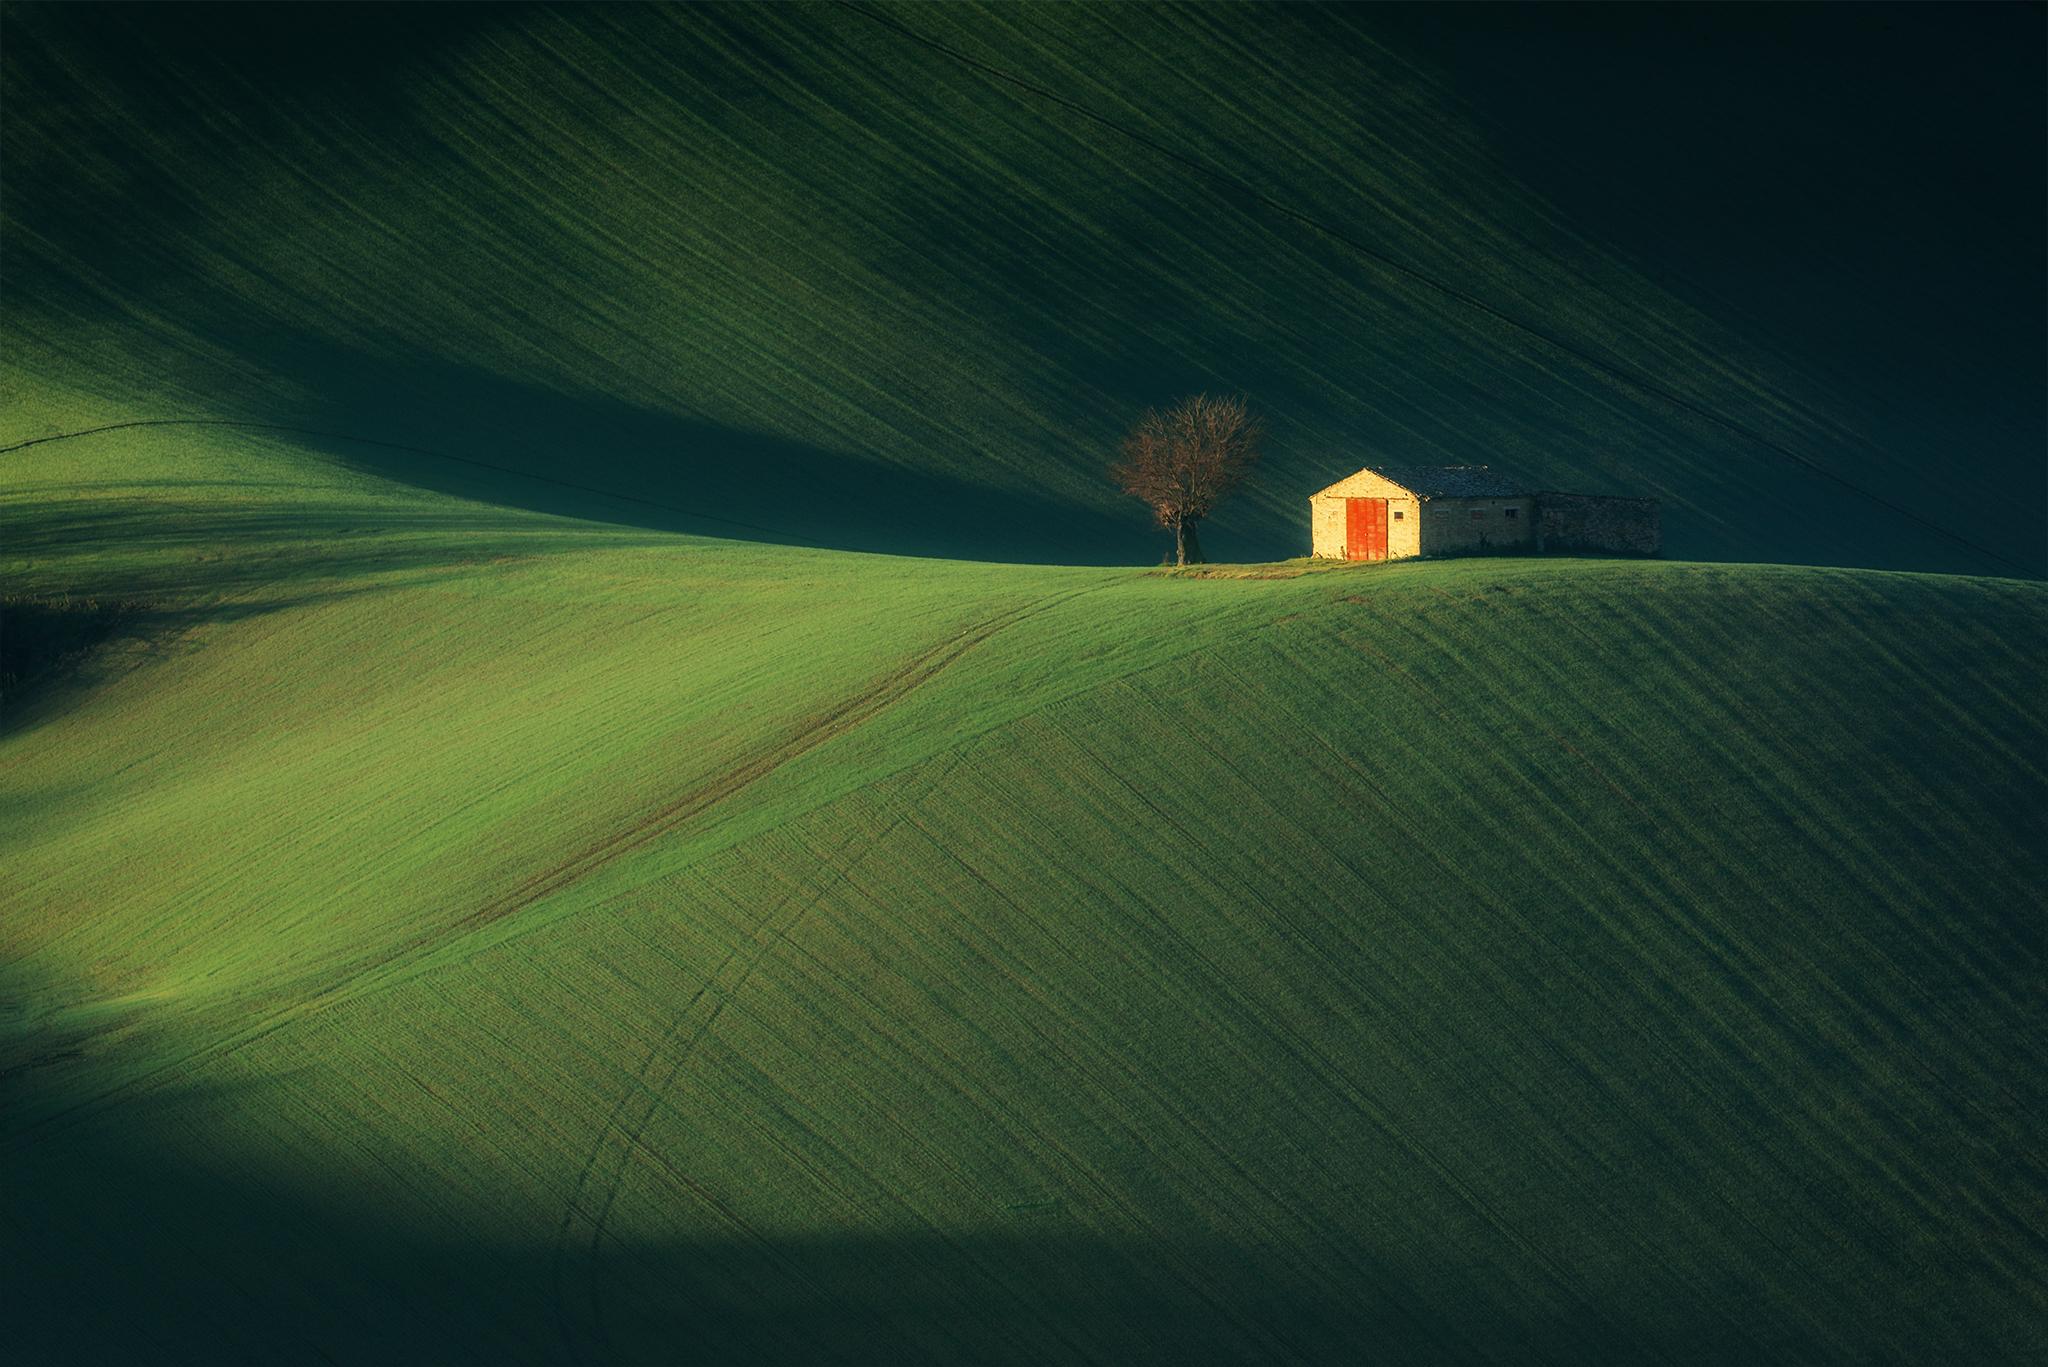 La casetta in Canadà  di Sergio Rapagnà